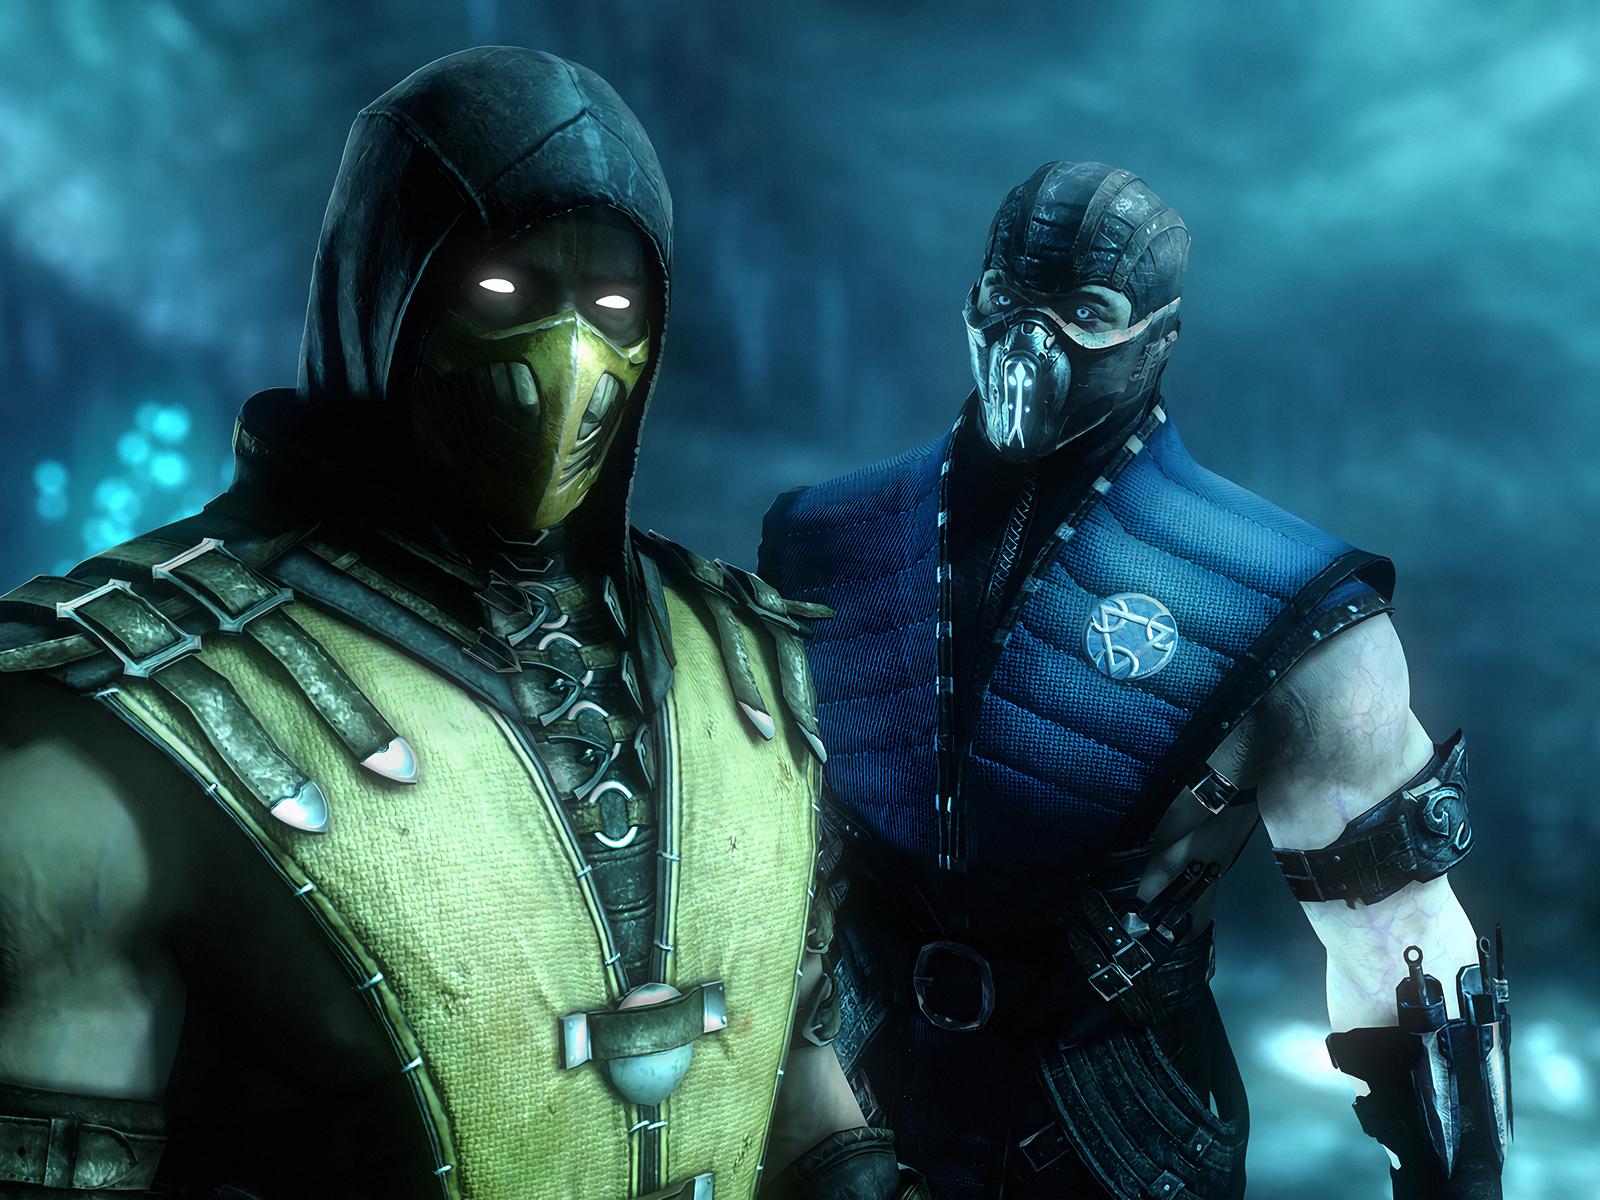 1600x1200 Sub Zero And Scorpion Mortal Kombat 4k 1600x1200